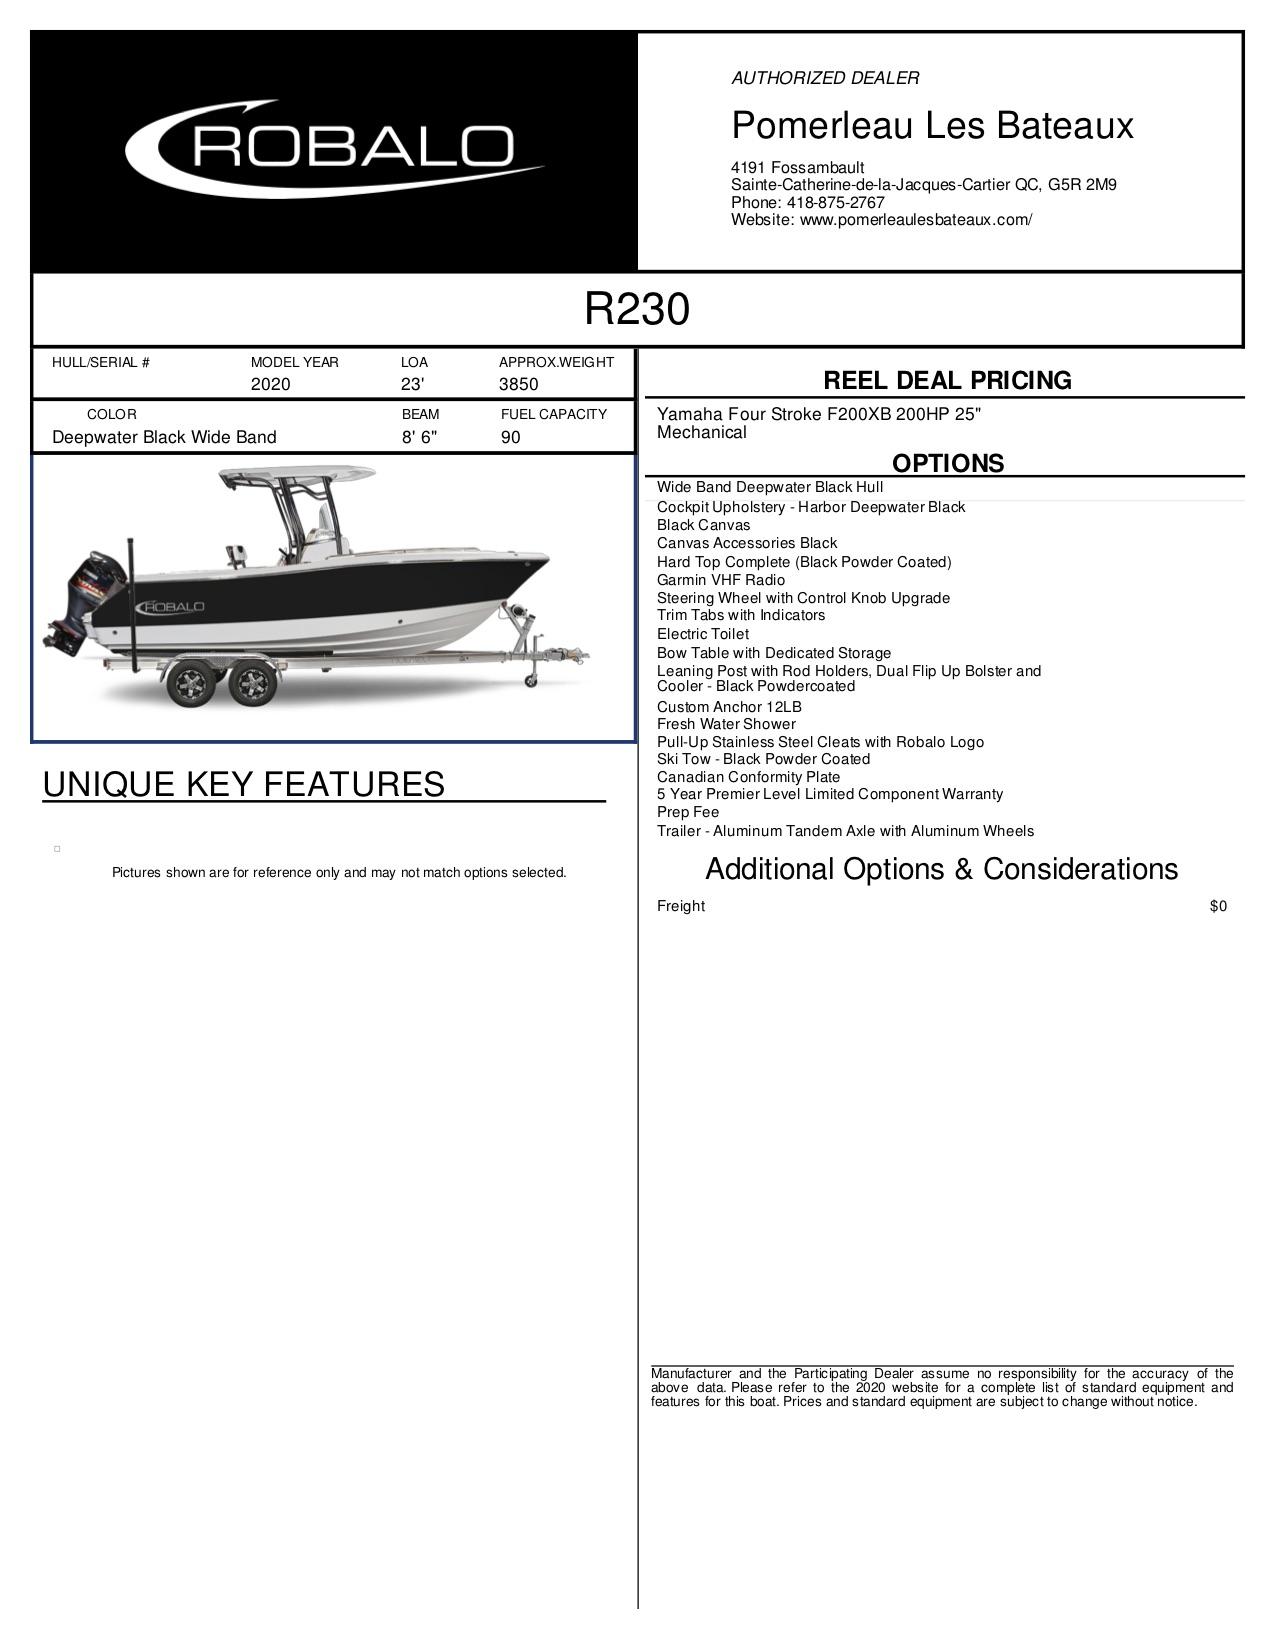 Robalo R230 - Robalo-2020-230--Window-Sticker-278944 (1)